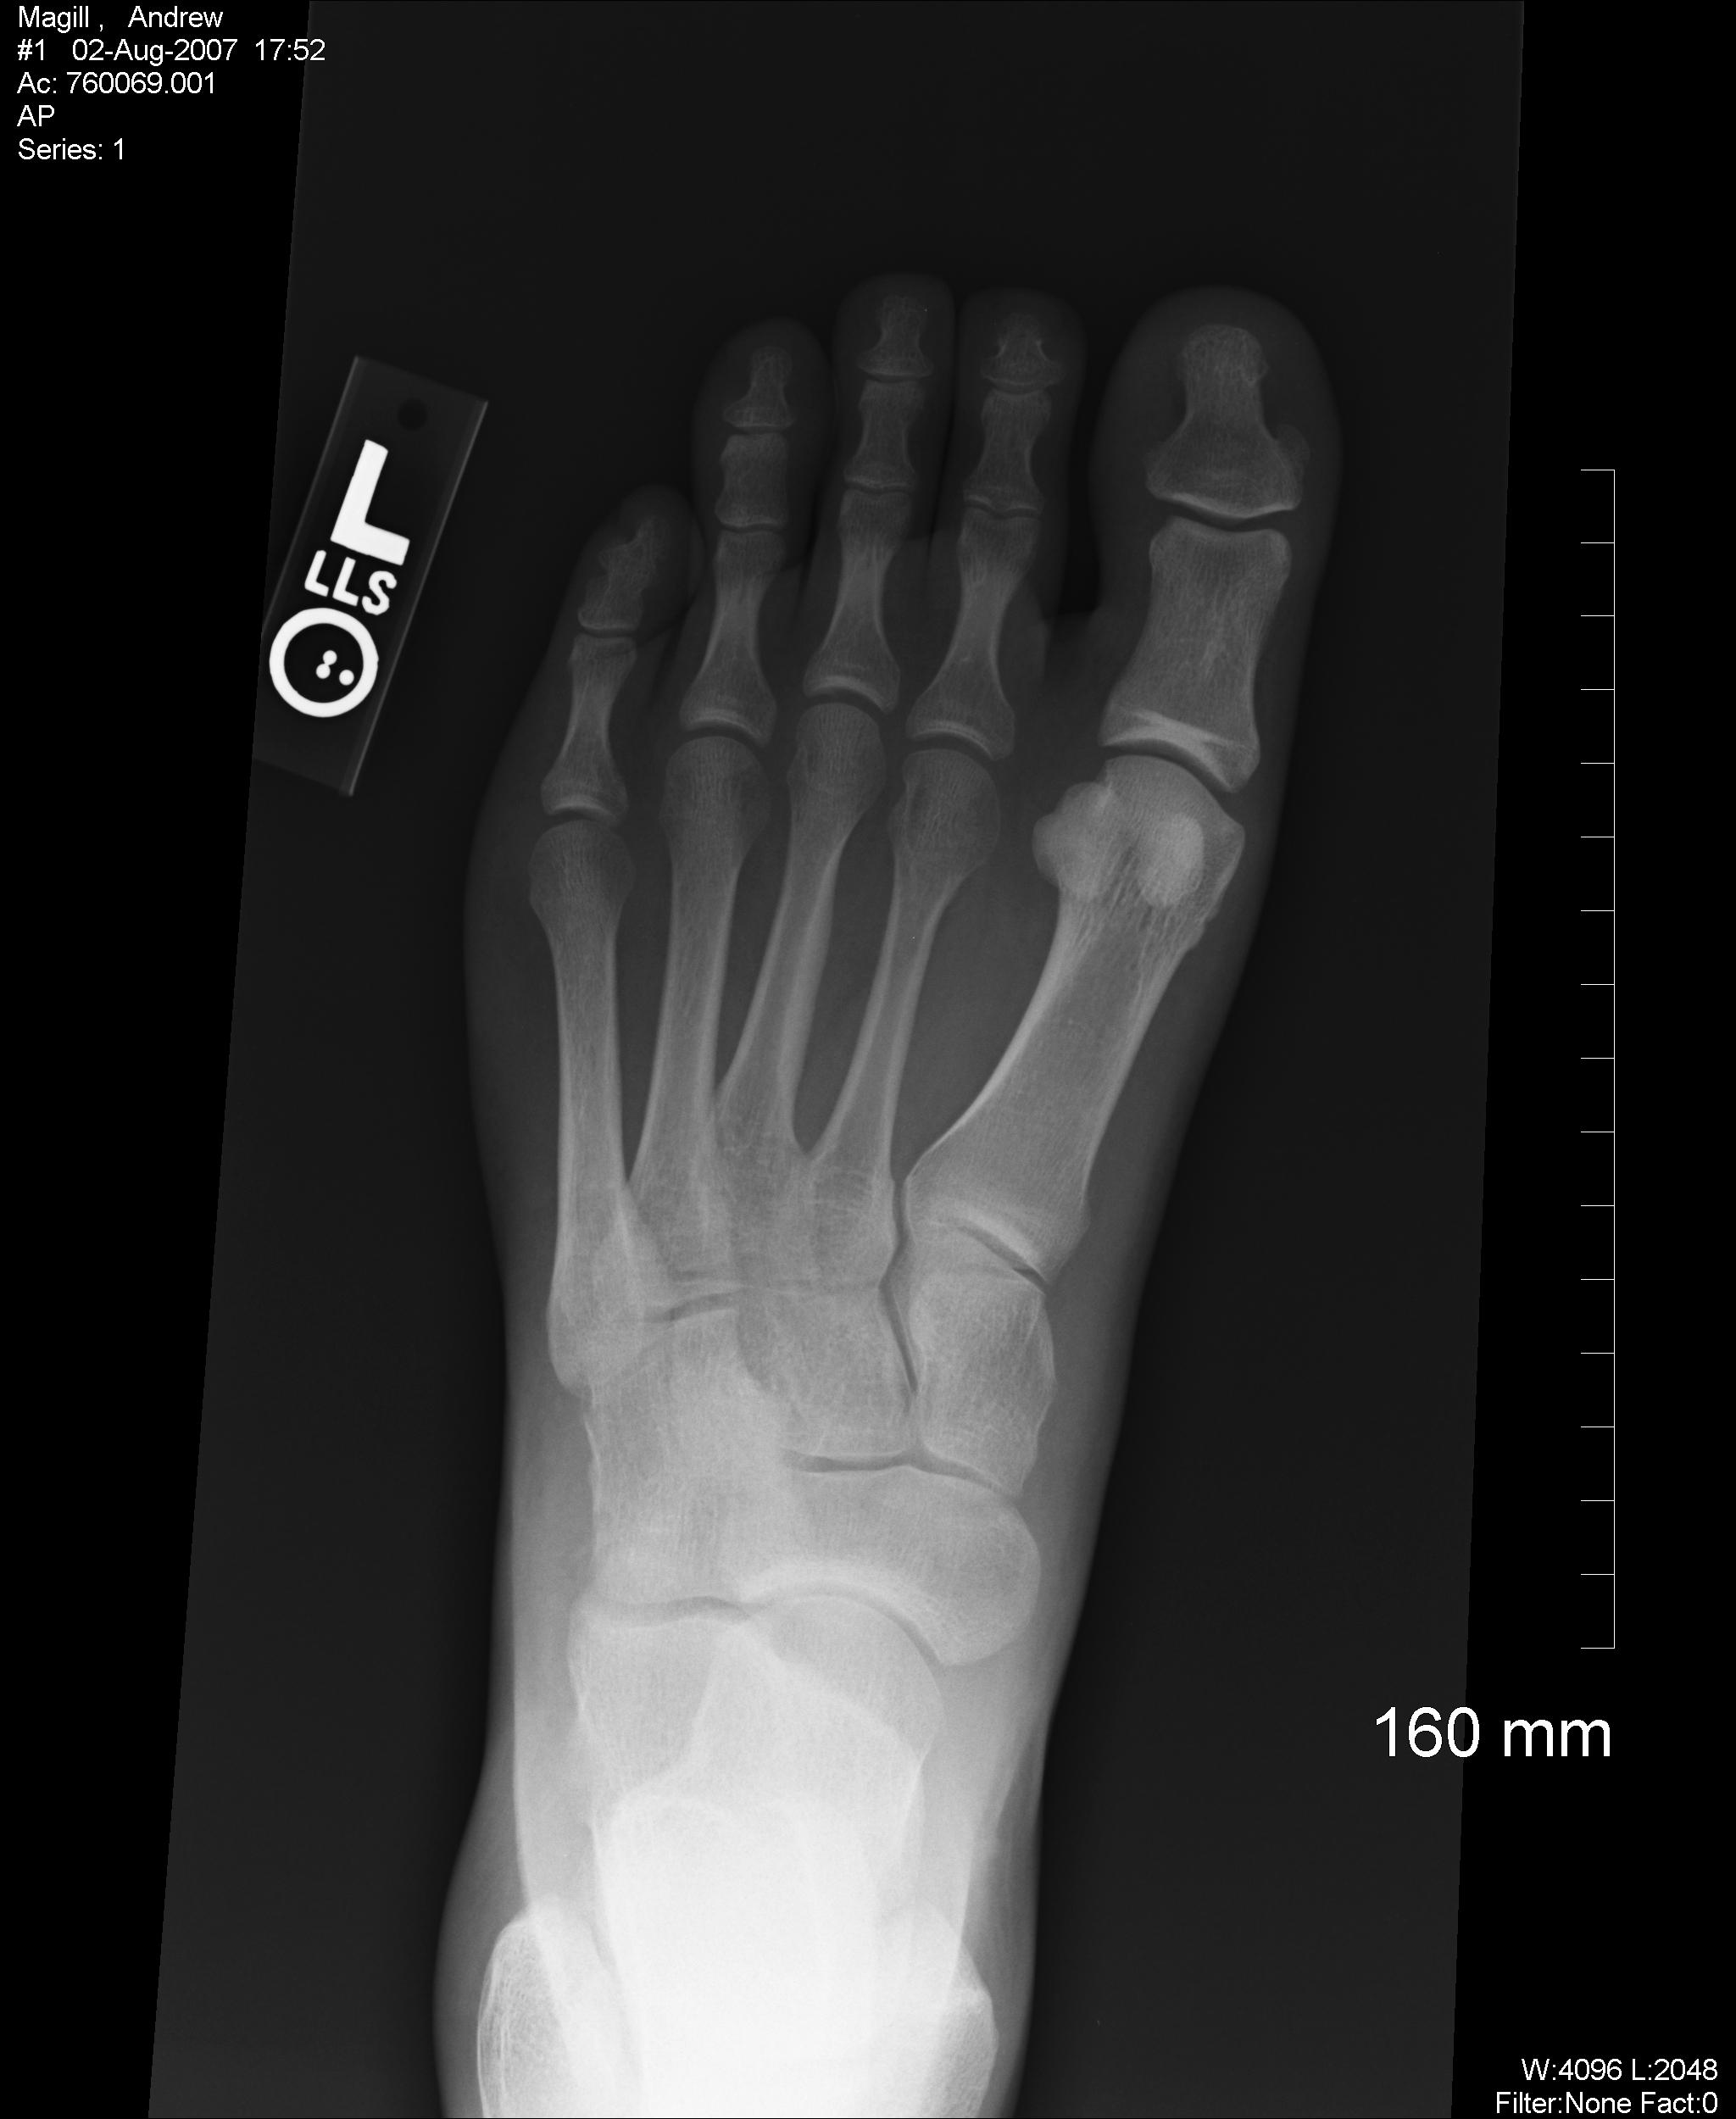 x-rays | Walthblog